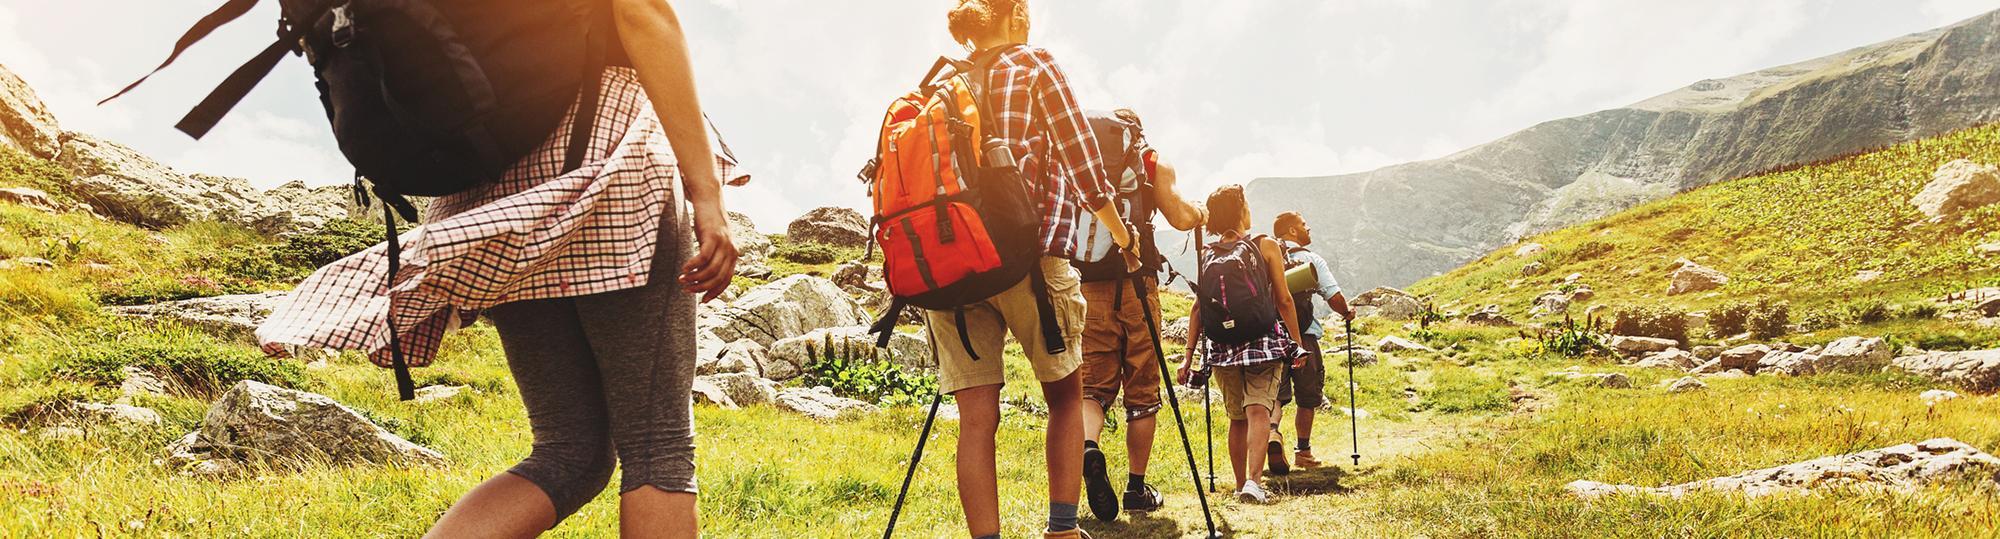 eastern mountain sports deal hero hiking